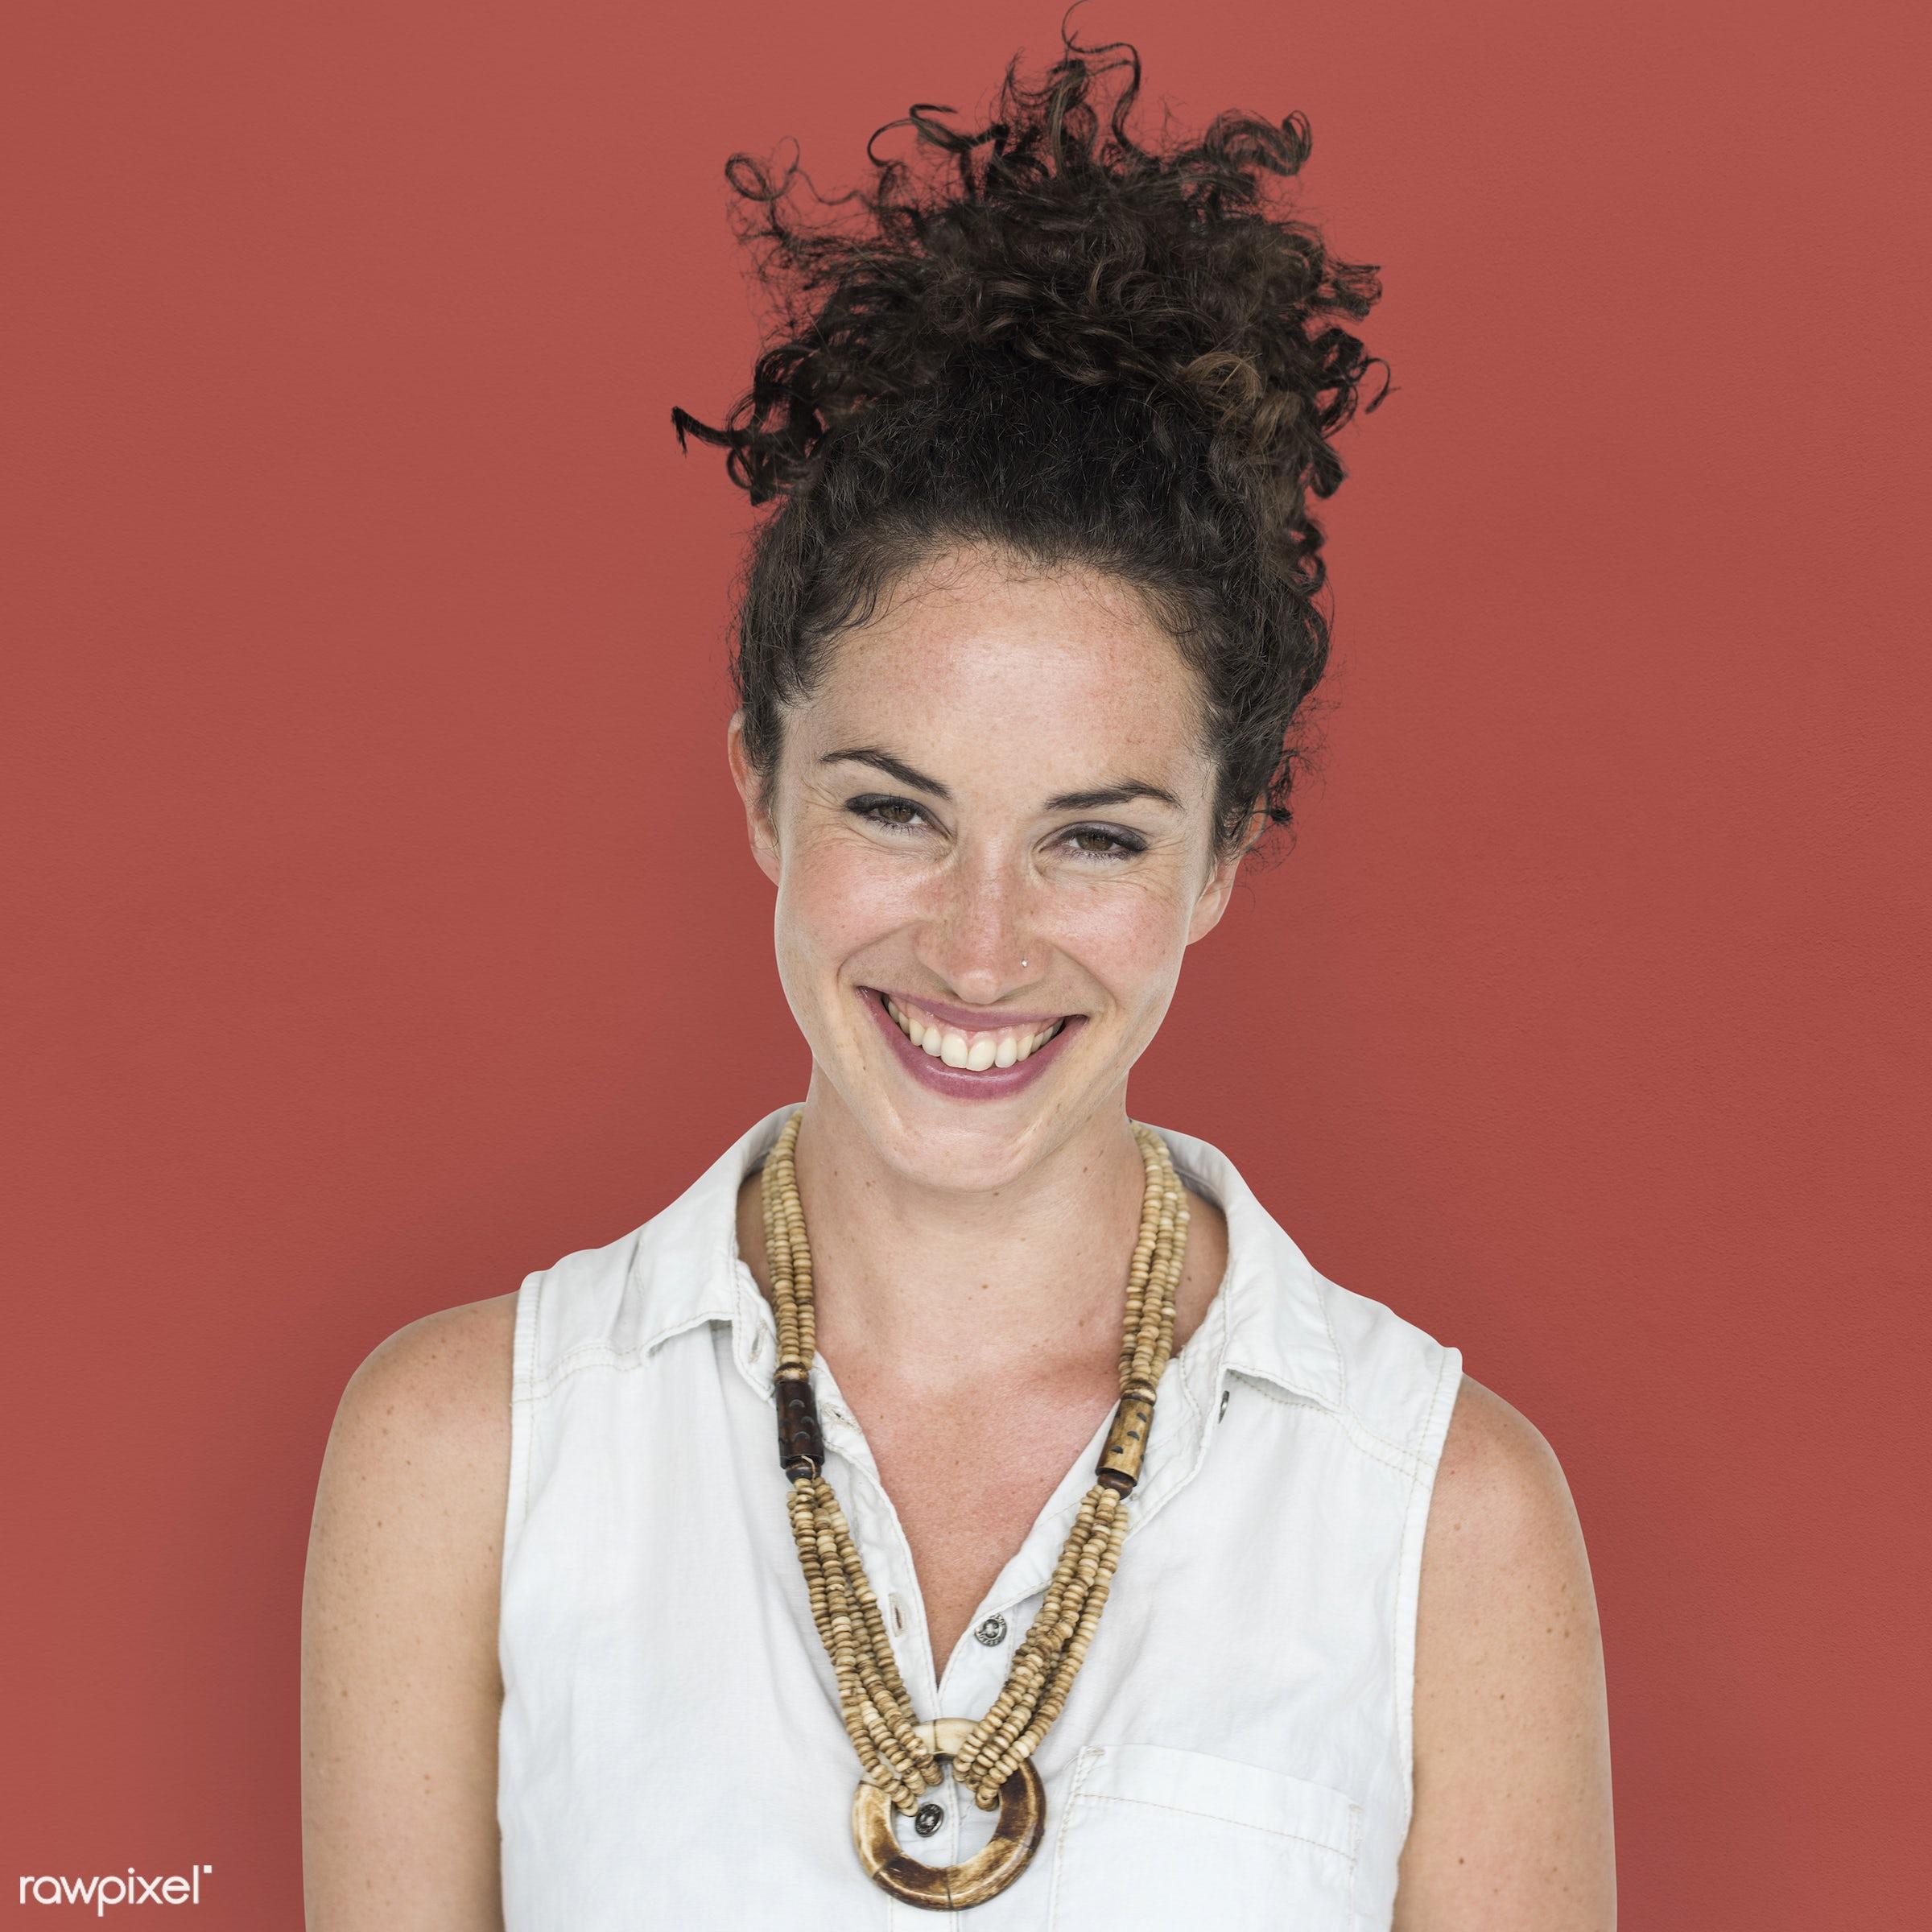 expression, studio, person, people, caucasian, girl, solo, woman, happy, attractive, casual, smile, positive, smiling,...